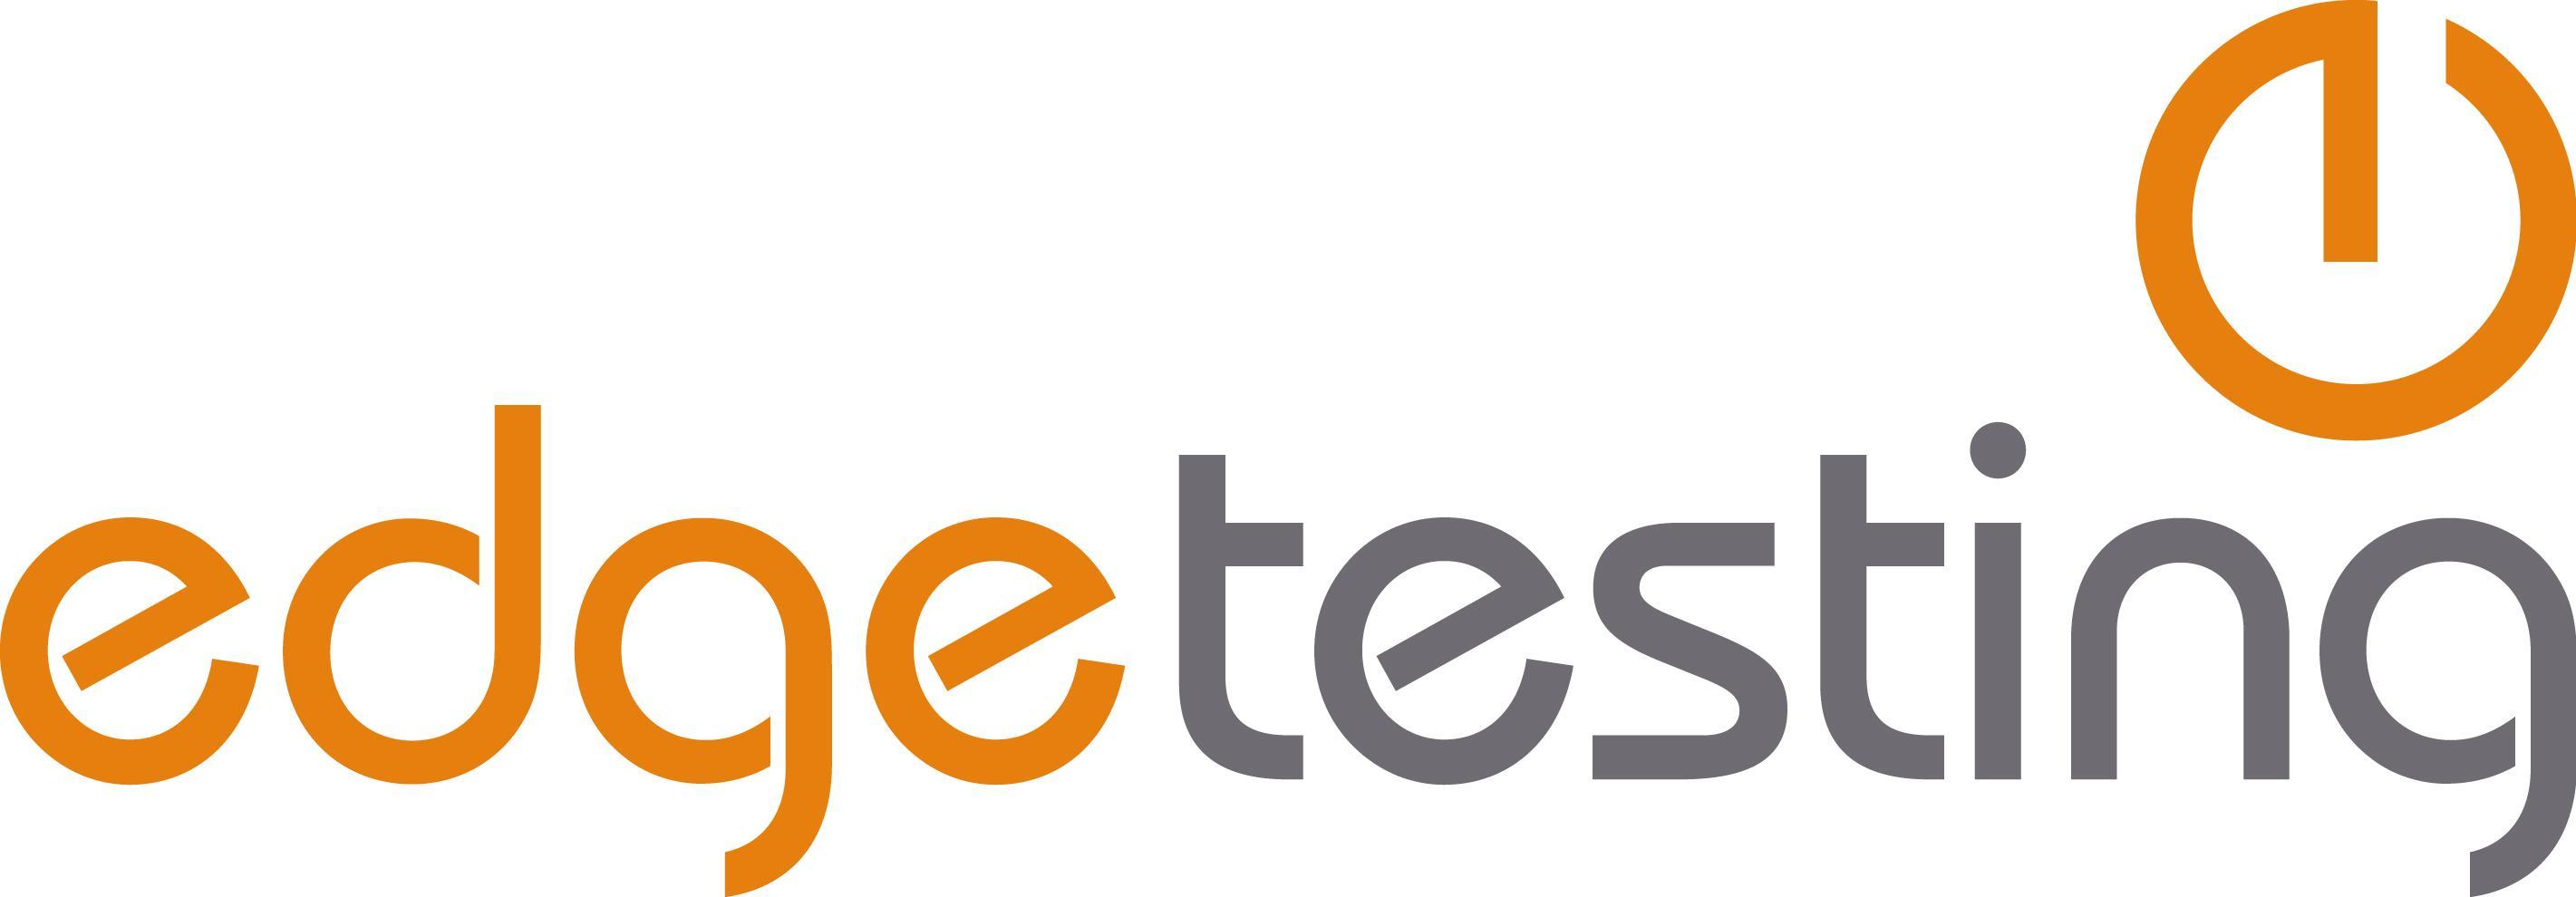 Edge Testing Logo